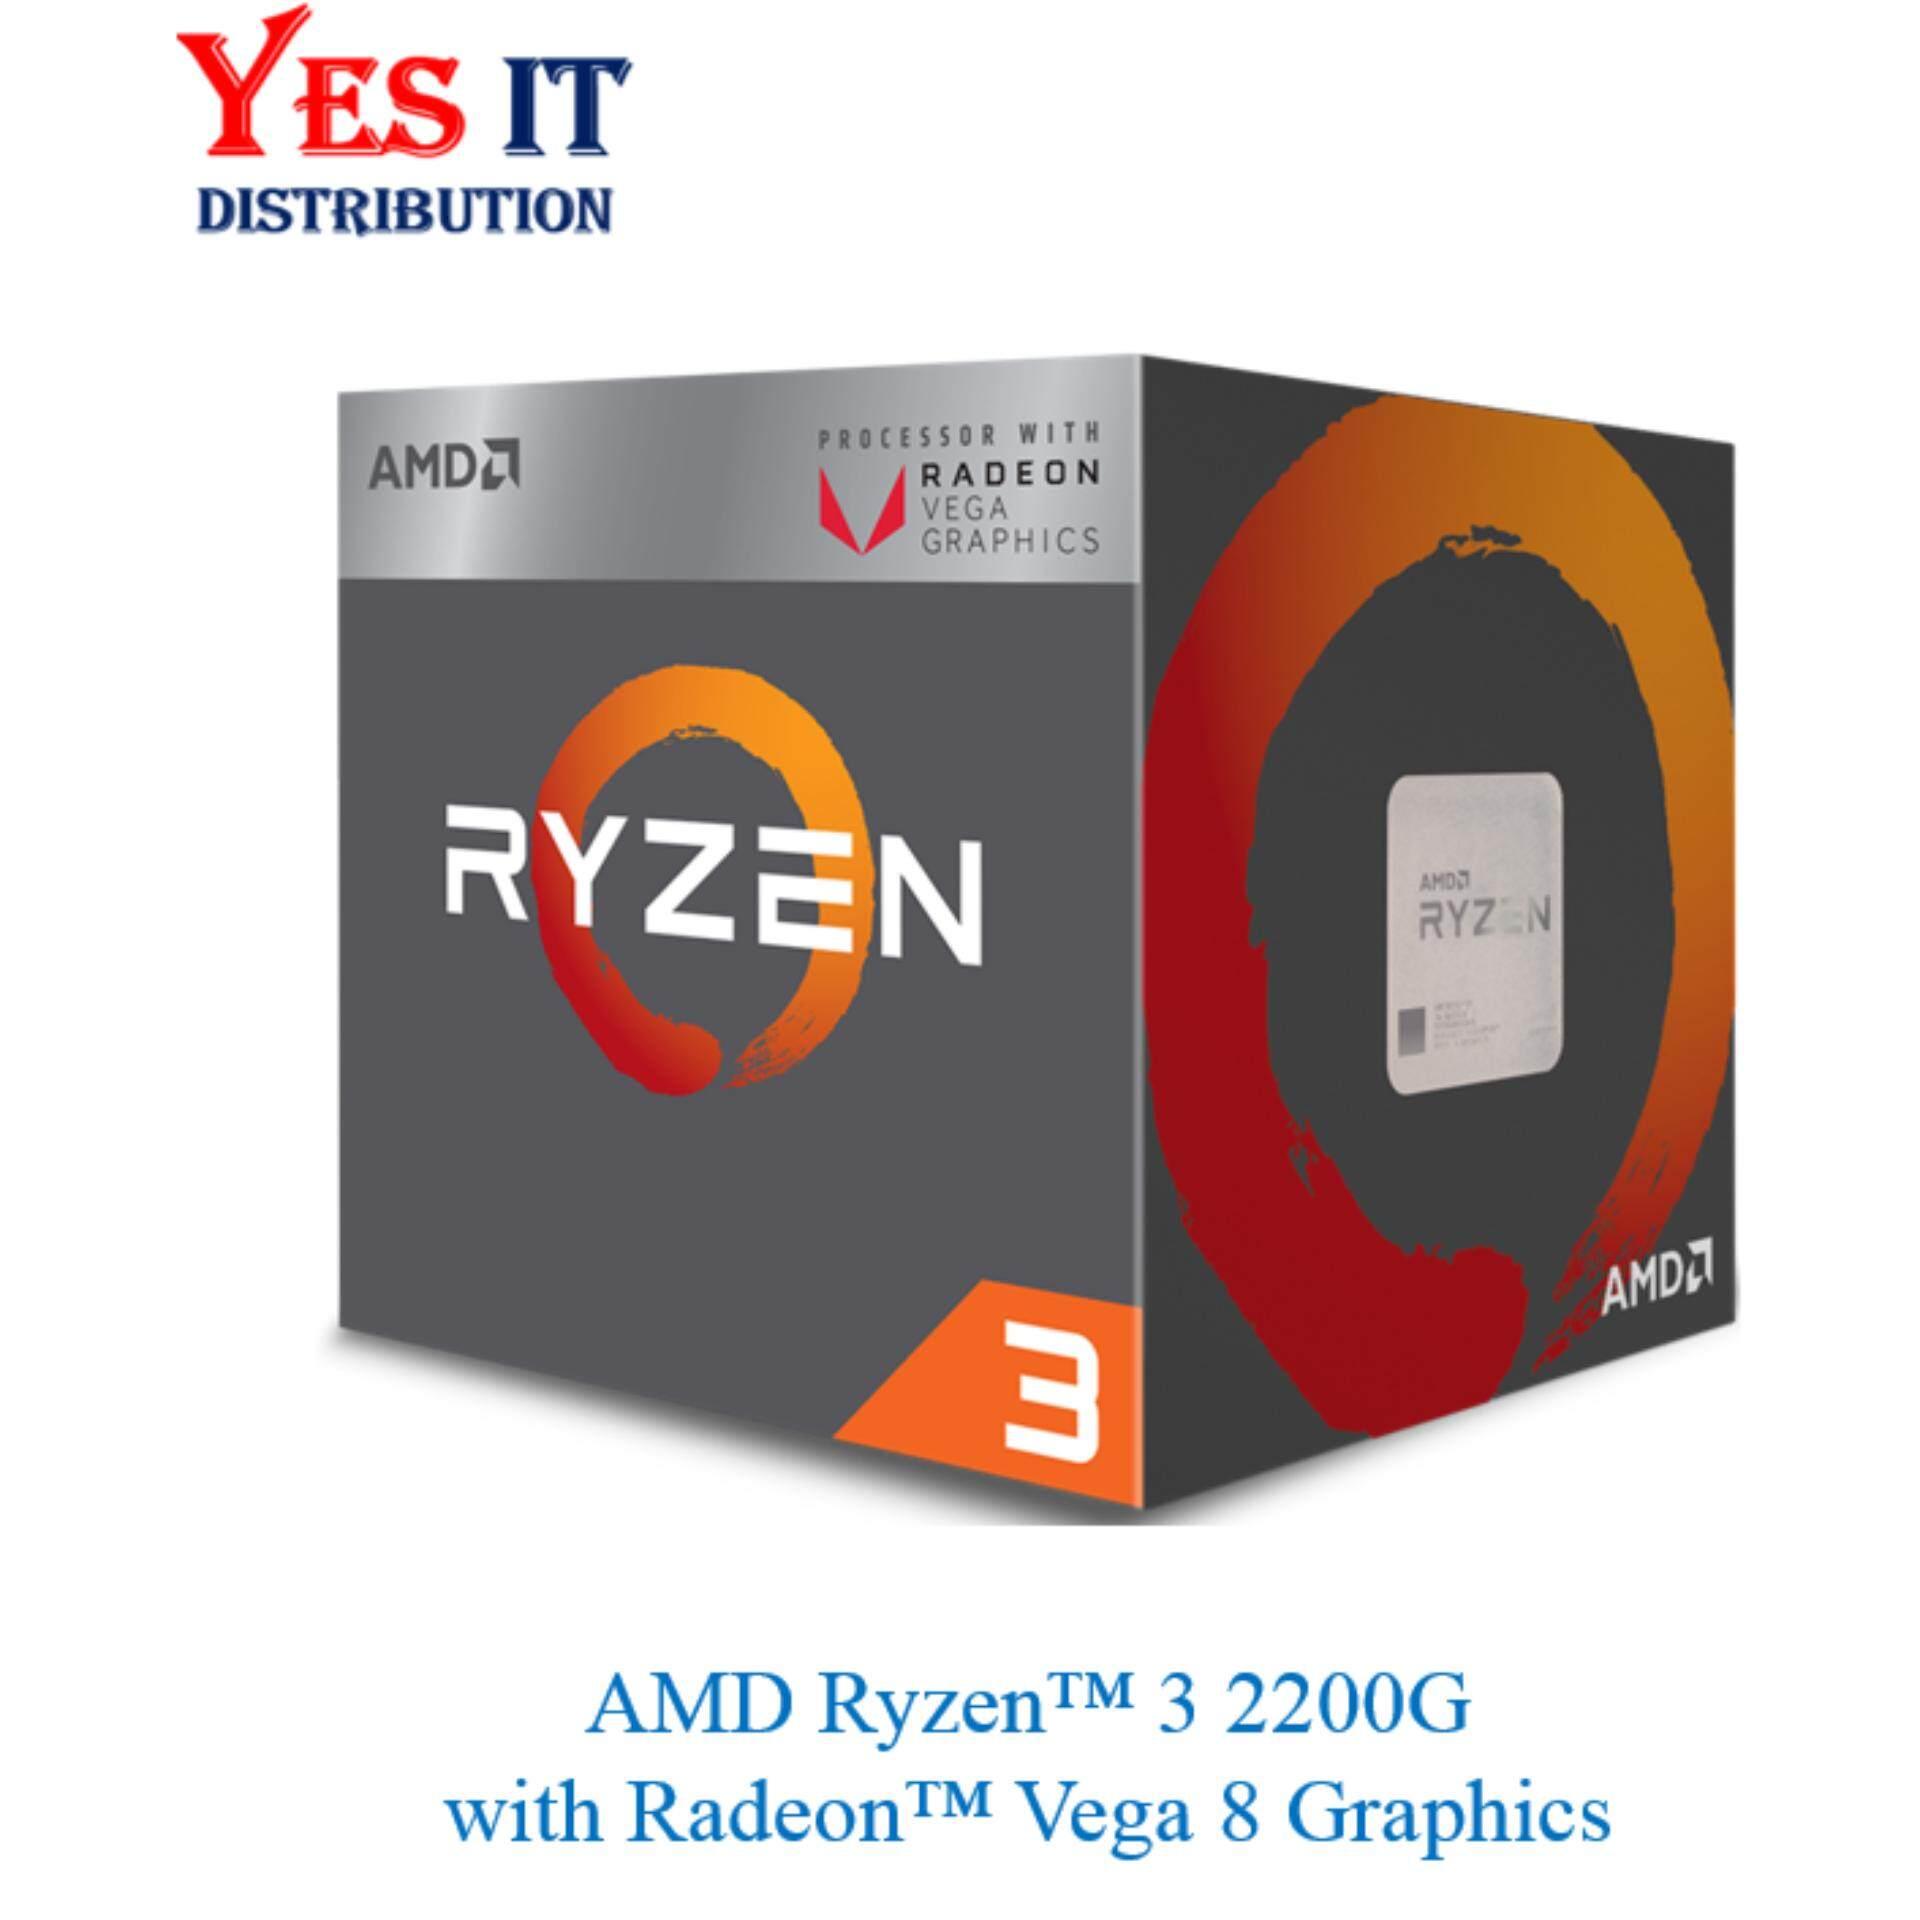 Amd Processors Price In Malaysia Best Lazada Athlon Ii X3 425 Ryzen 3 2200g With Radeon Vega 8 Graphics Processor 37ghz 6mb Cache